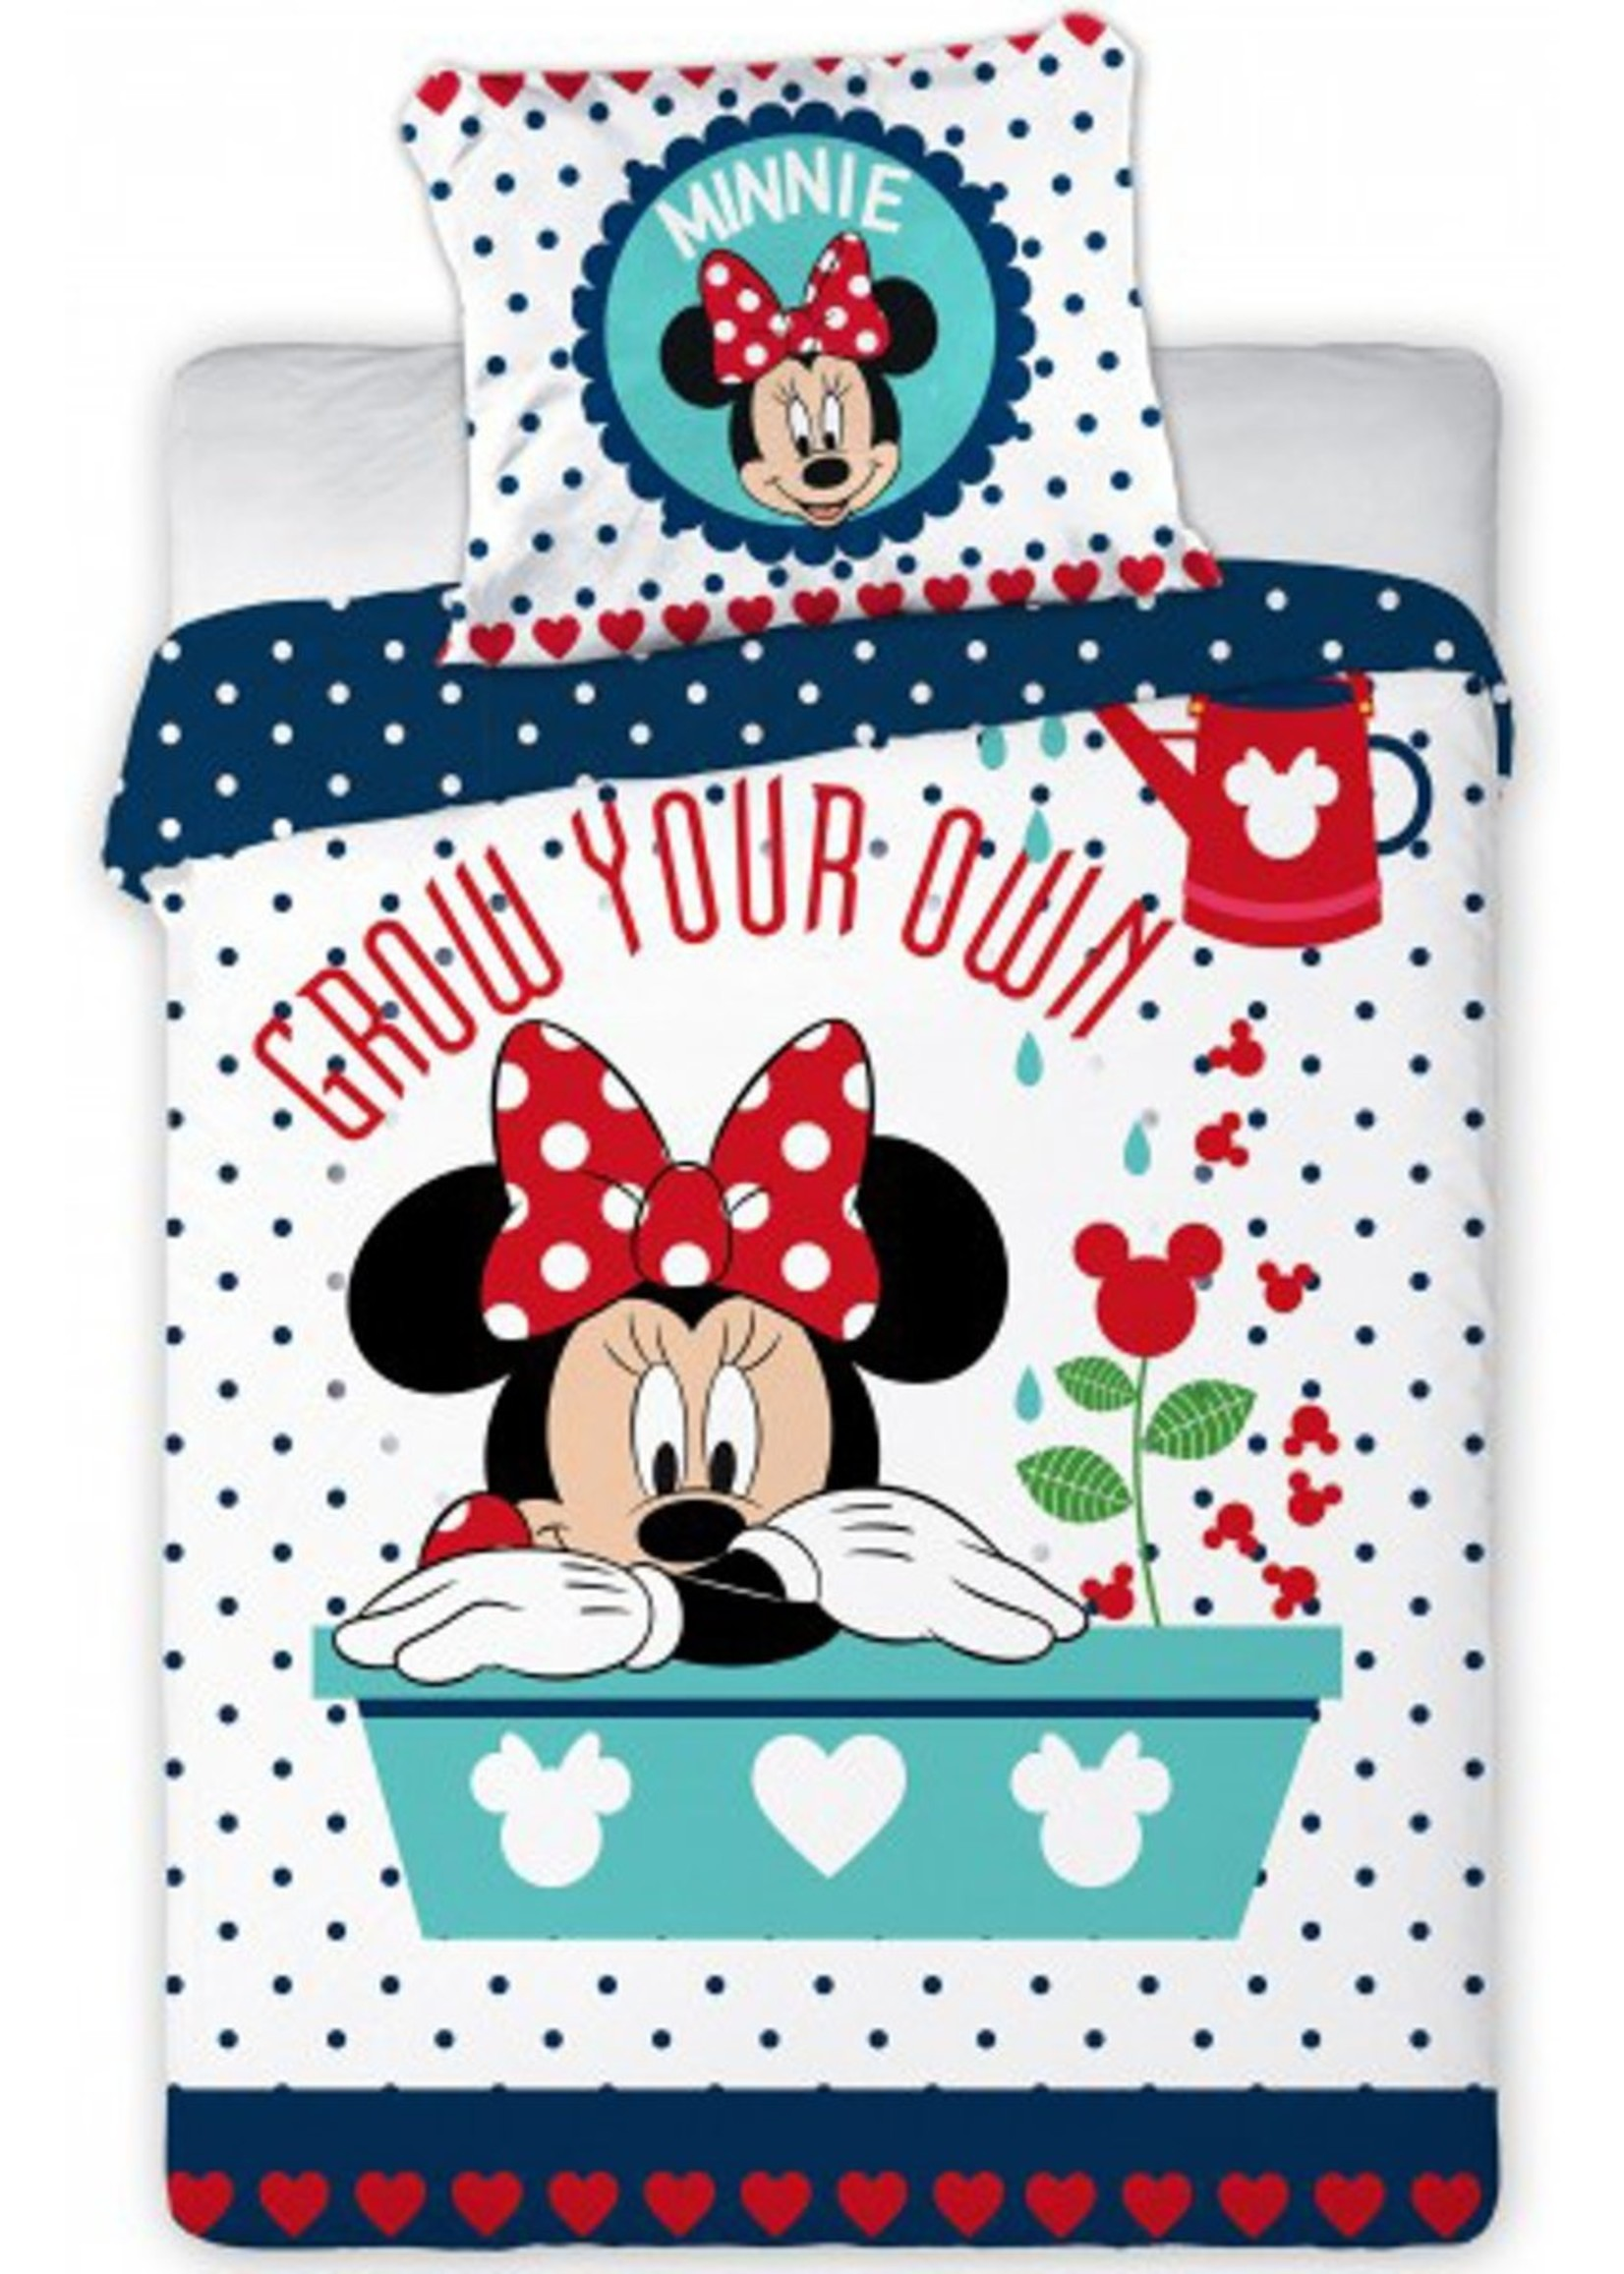 Disney Minnie Mouse  Junior Dekbedovertrek Grow Your Own